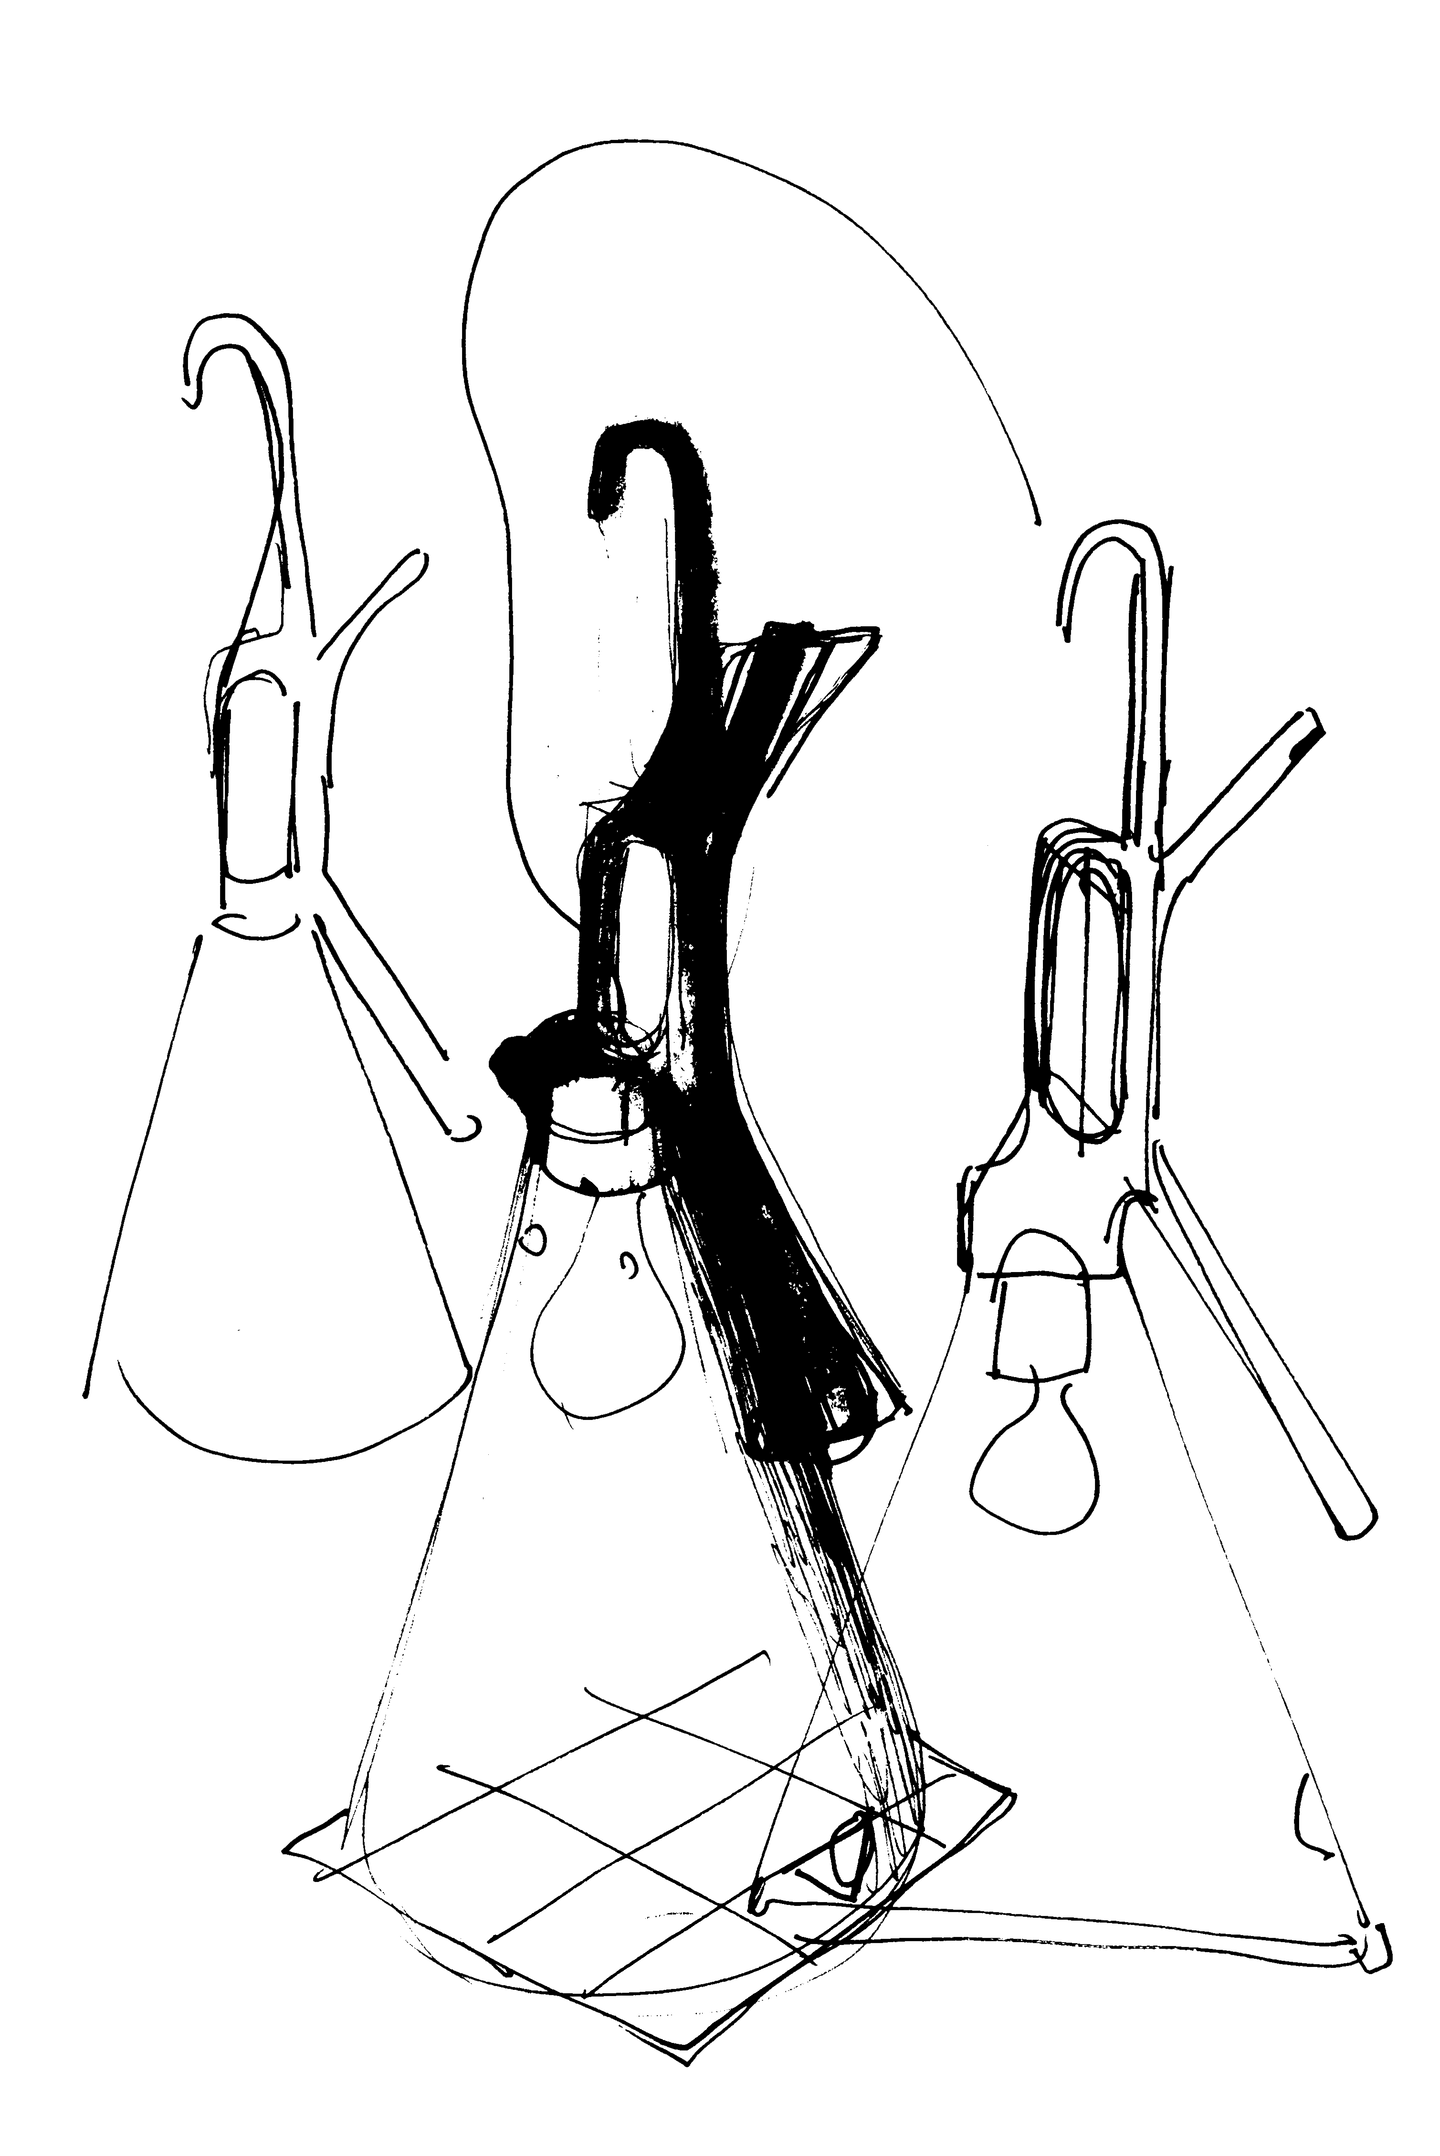 designers-konstantin-grcic-flos-08